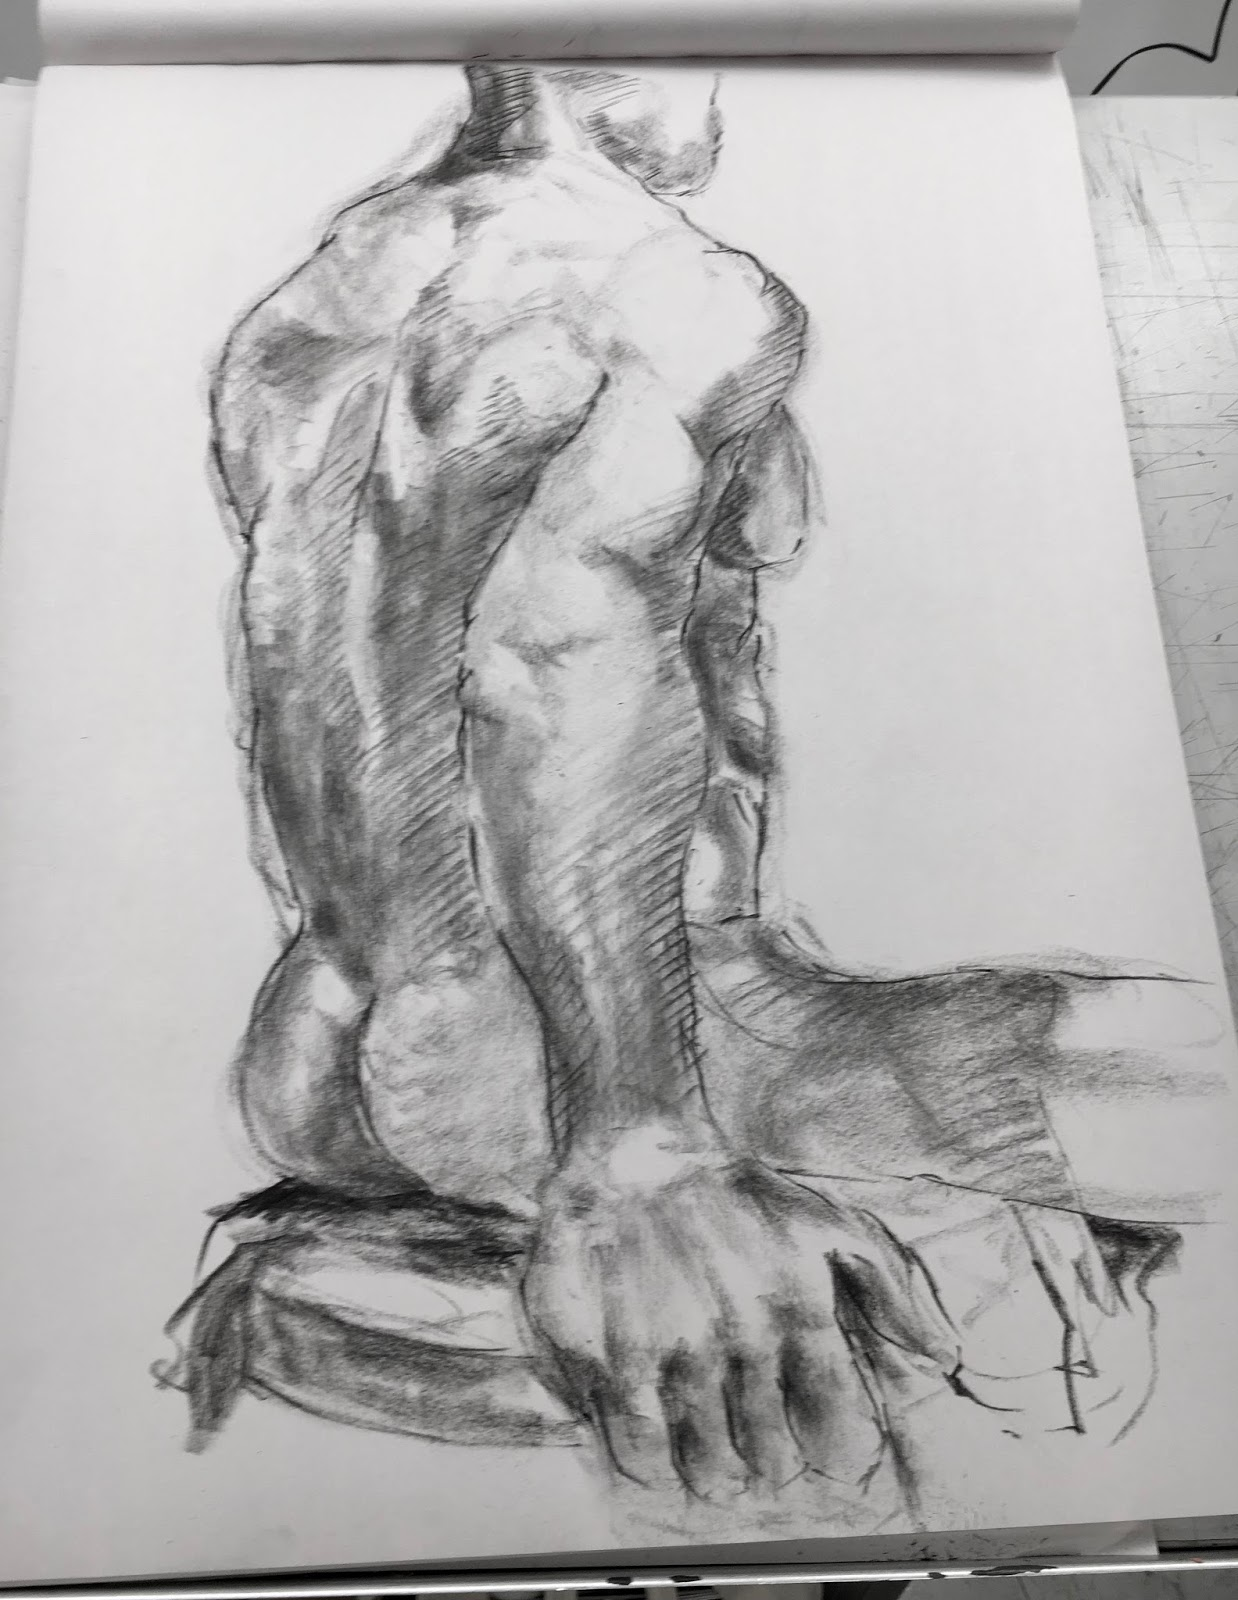 Grace Burney Parsons Anatomy Life Drawing S18